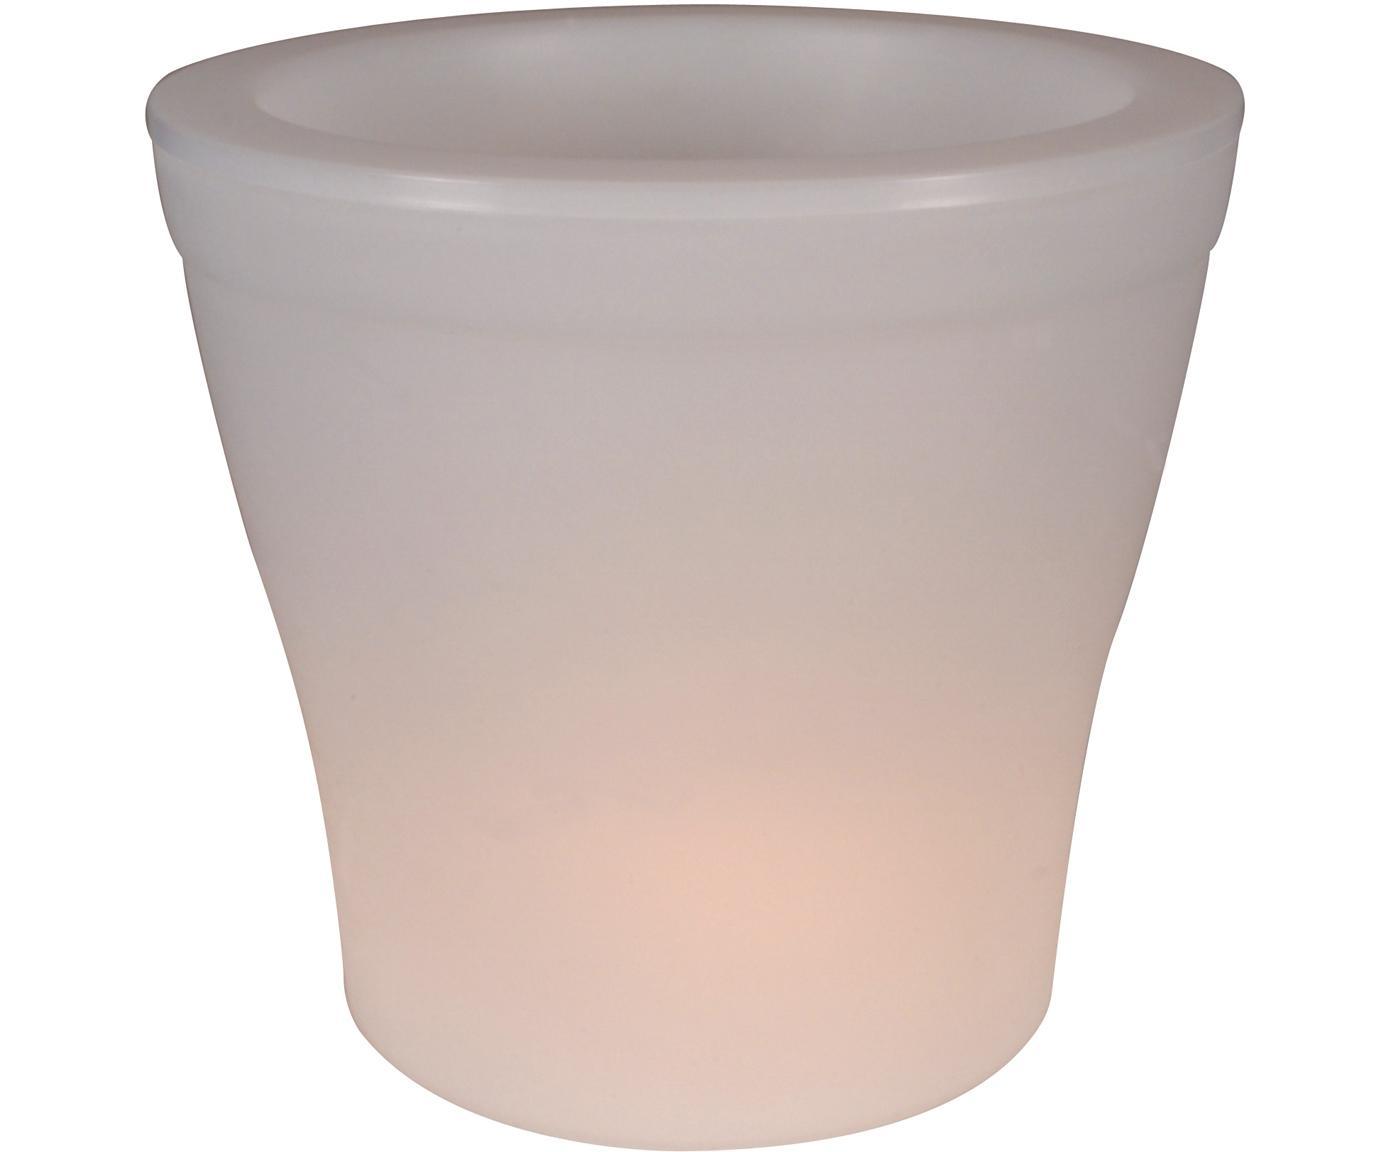 Mobiele outdoor LED lamp Flowerpot, Kunststof, Wit, Ø 39 x H 37 cm